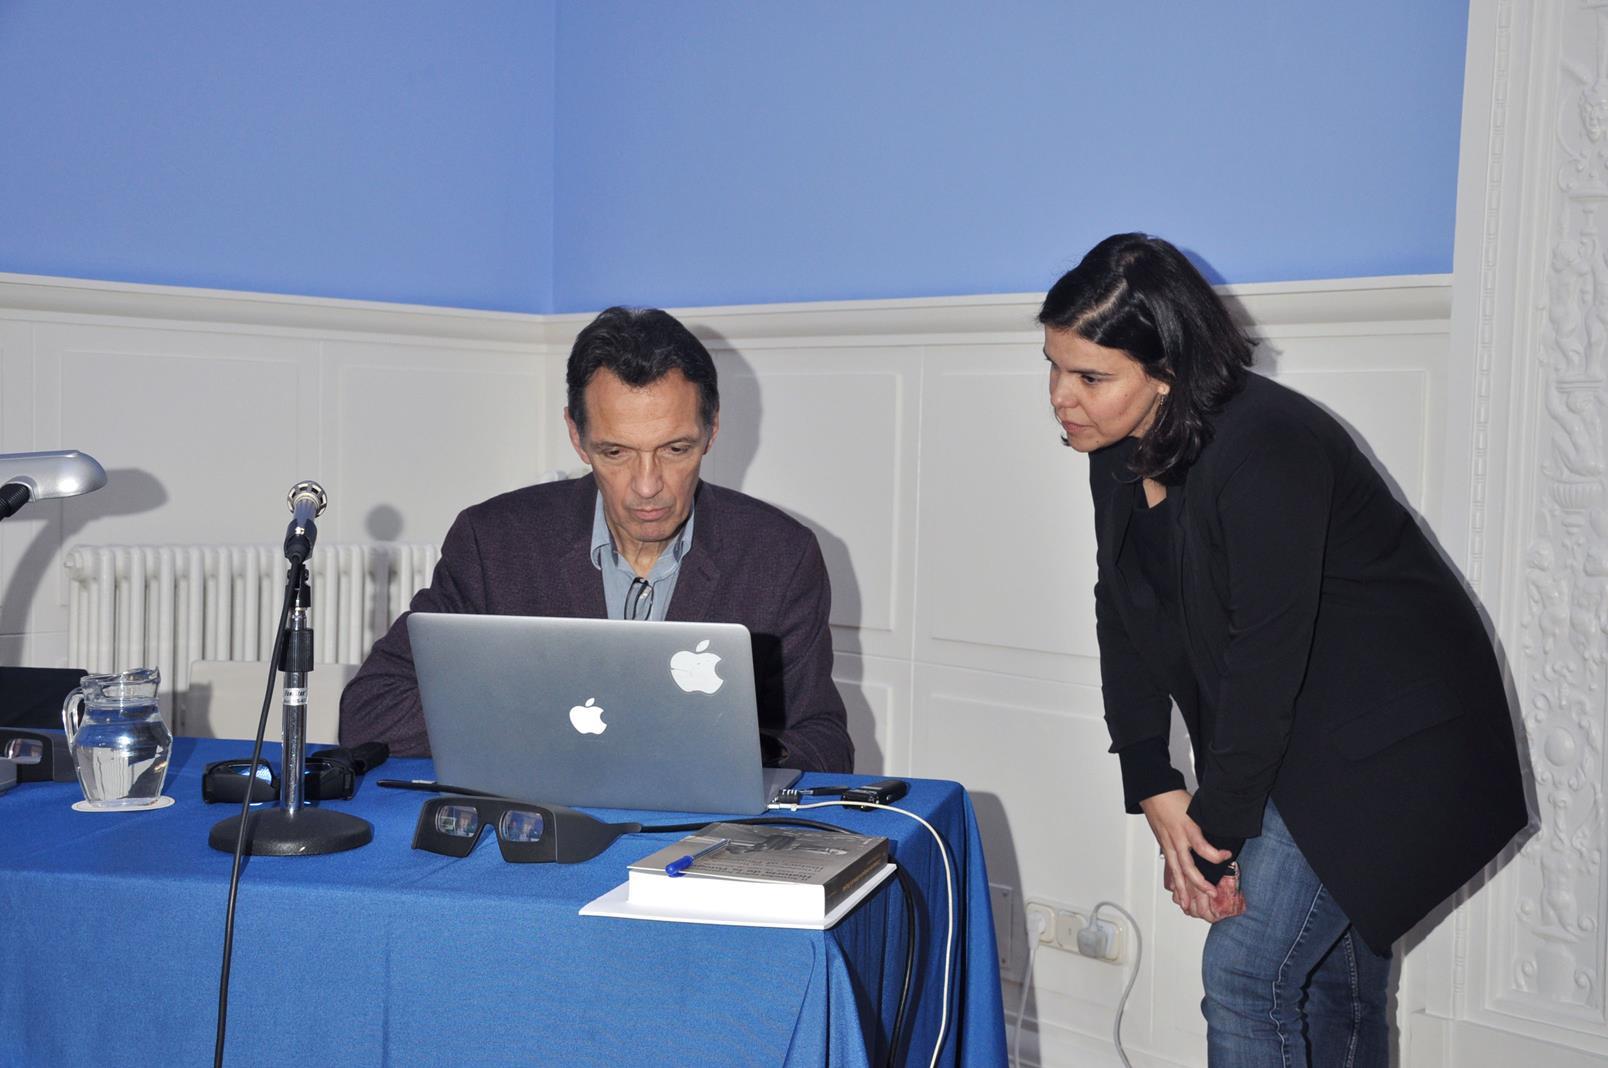 Denis Pellerin y Beatriz Sánchez Torija. 23/10/19